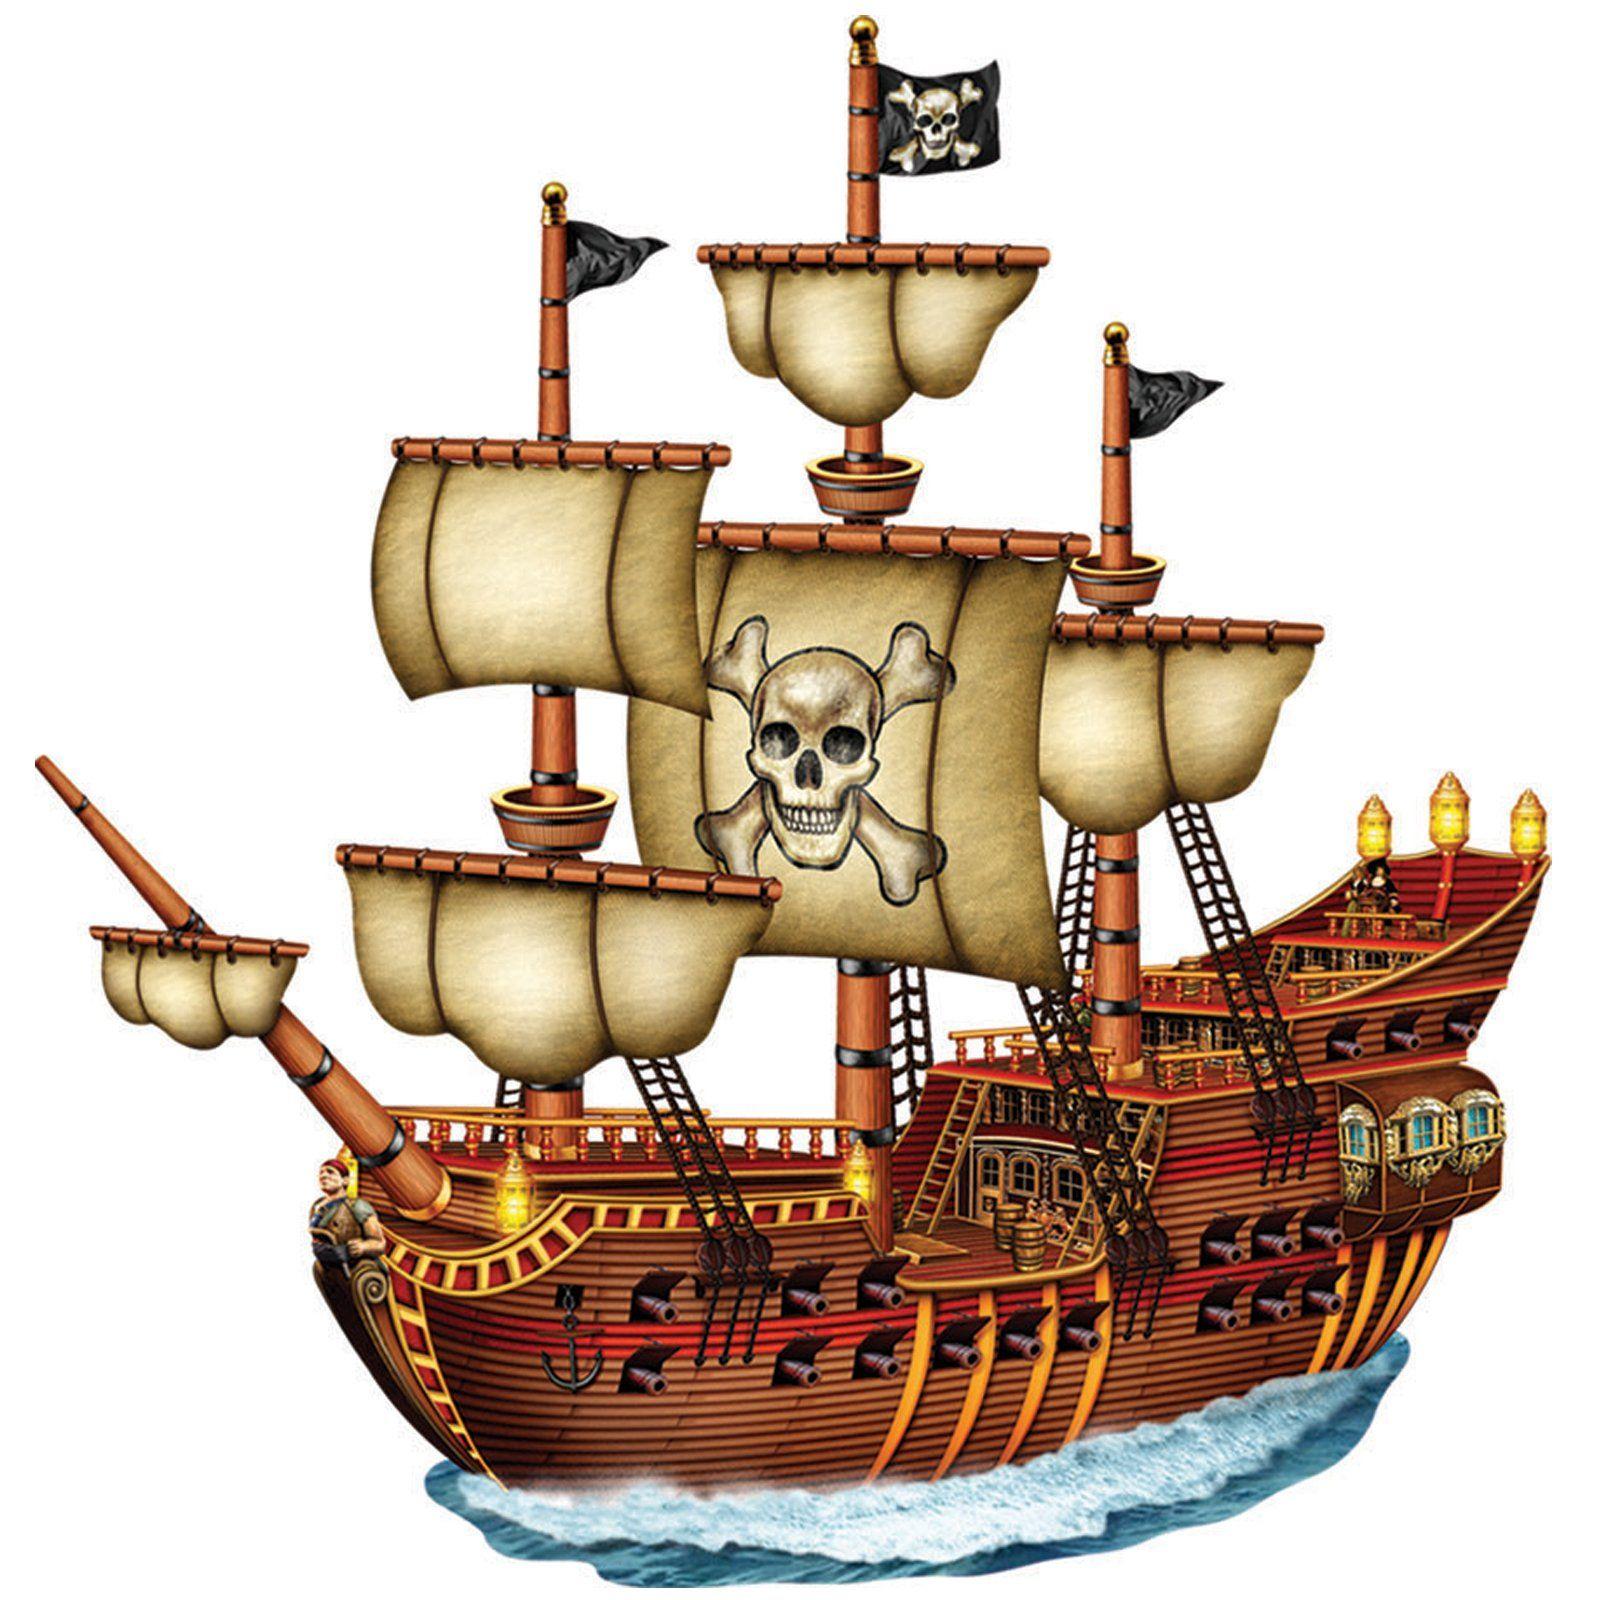 Inspirant Coloriage A Imprimer Bateau Pirate Gratuit